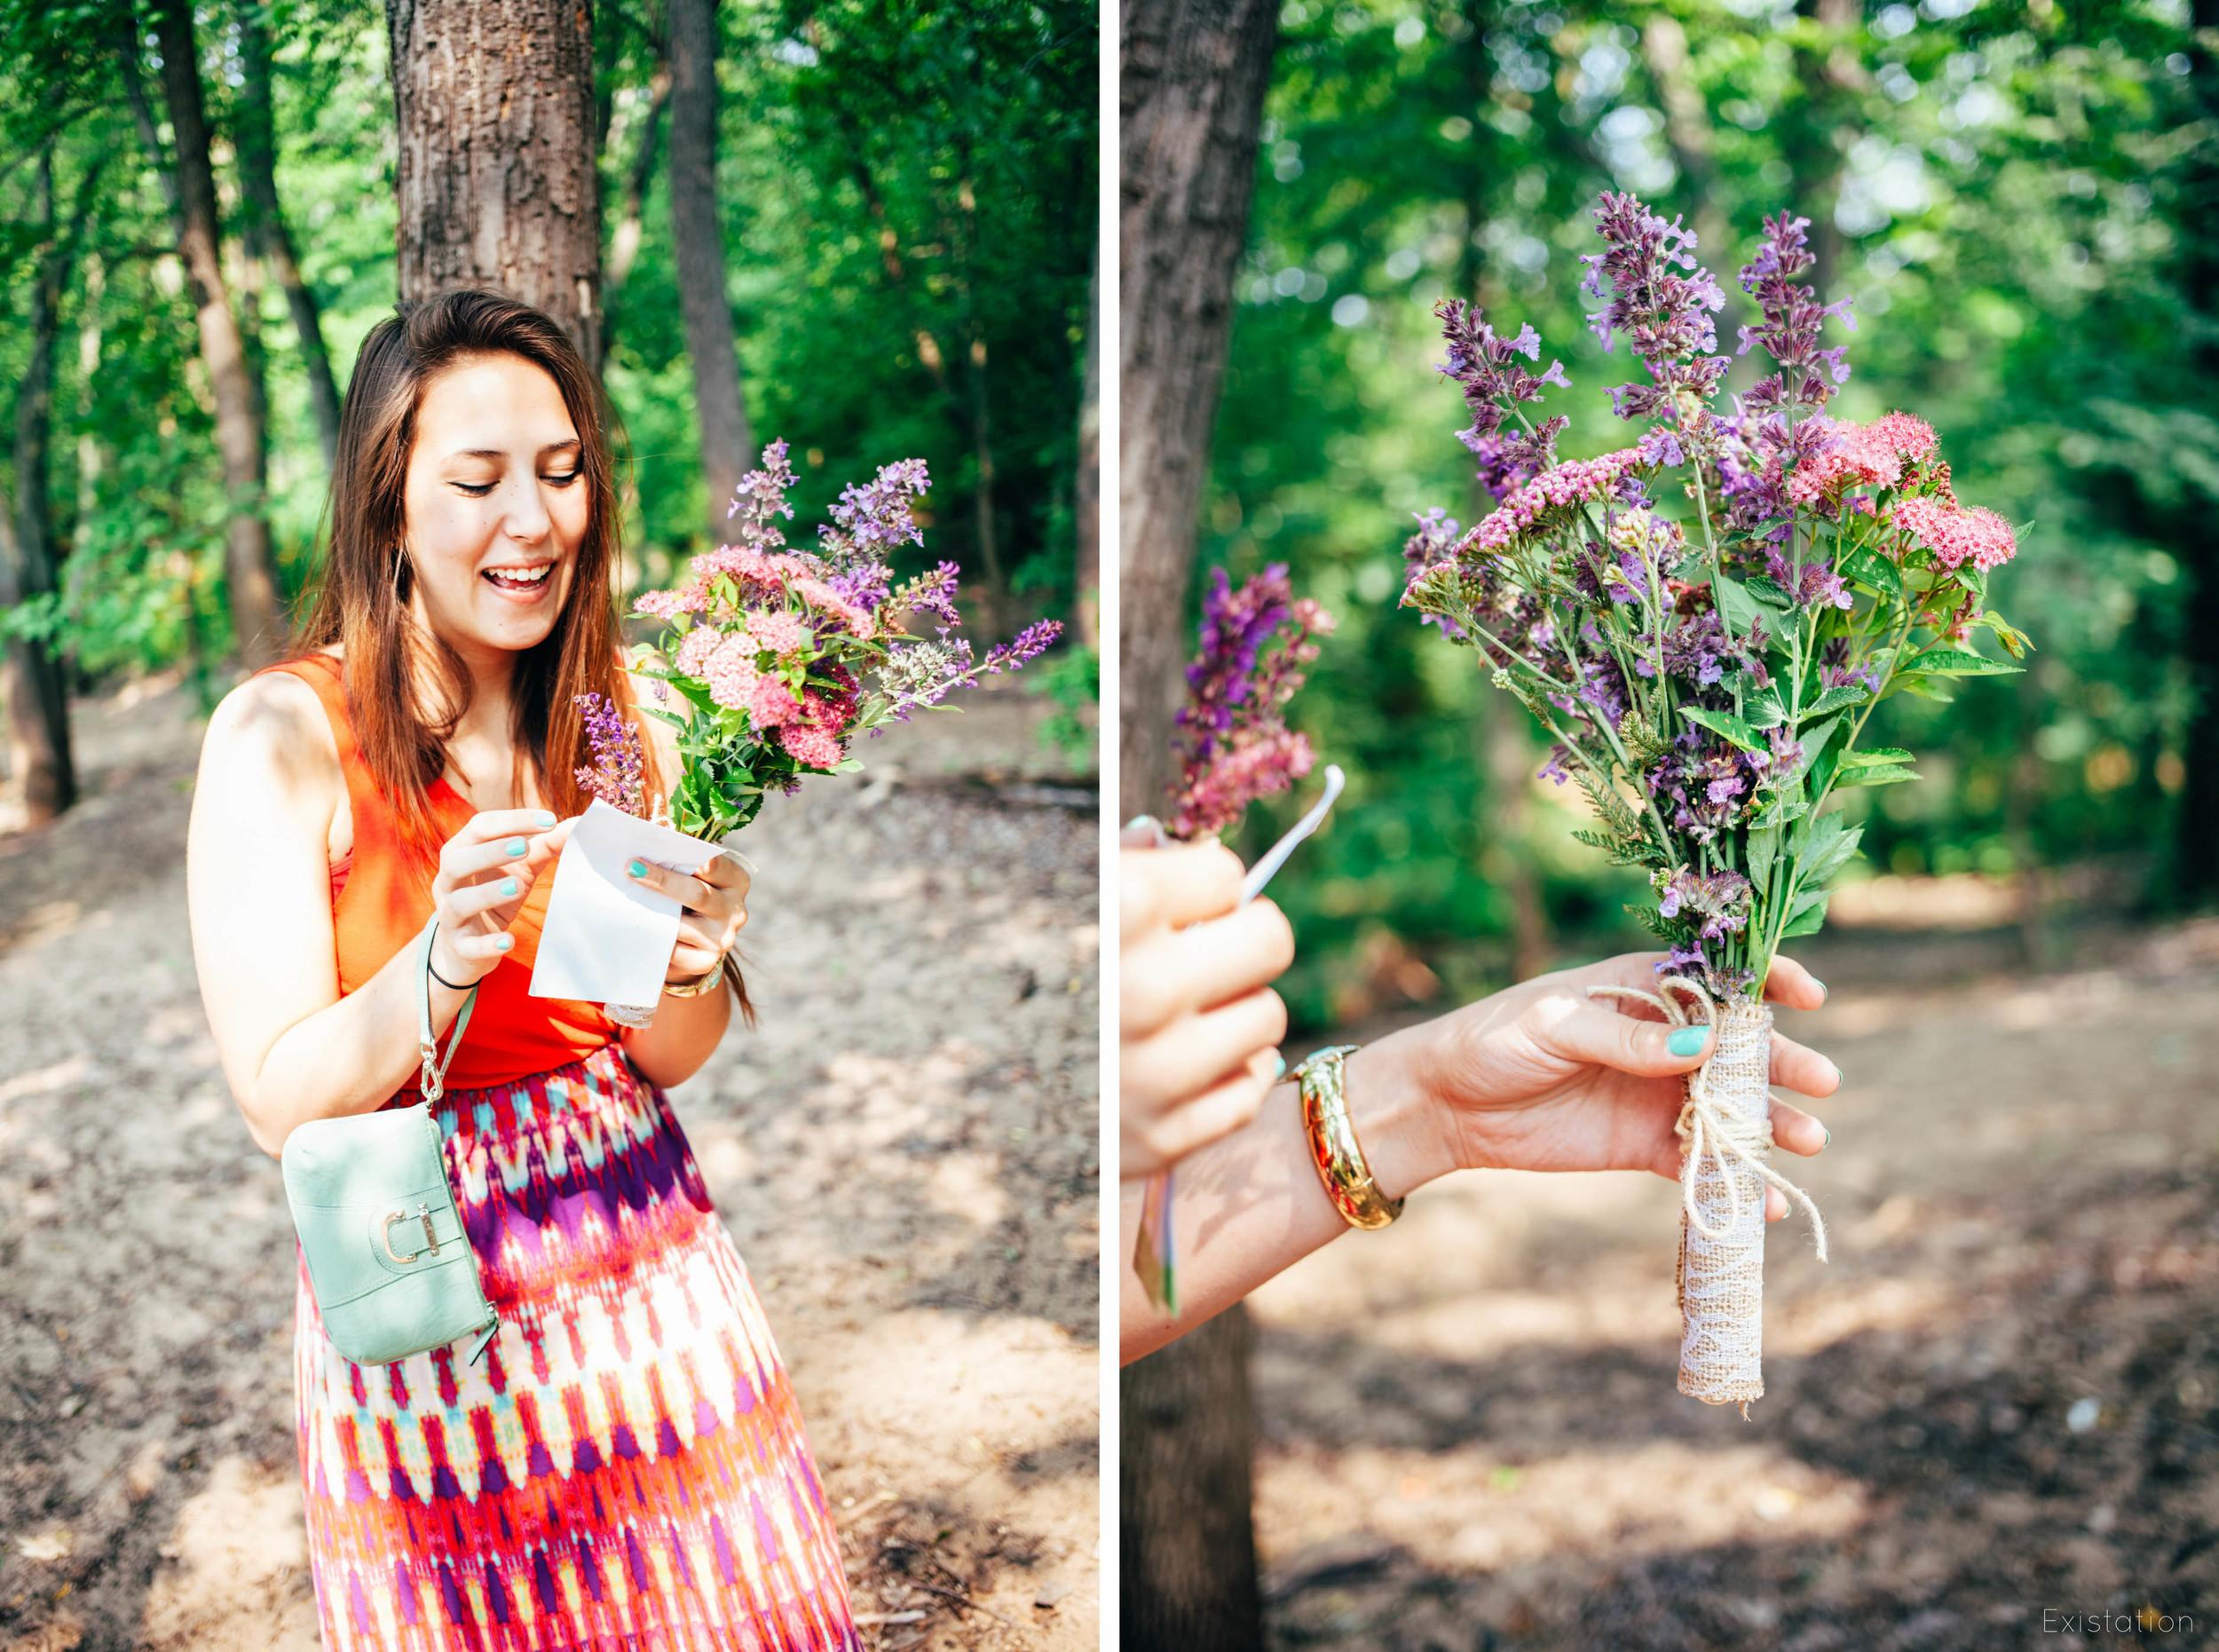 st croix wedding flowers.jpg